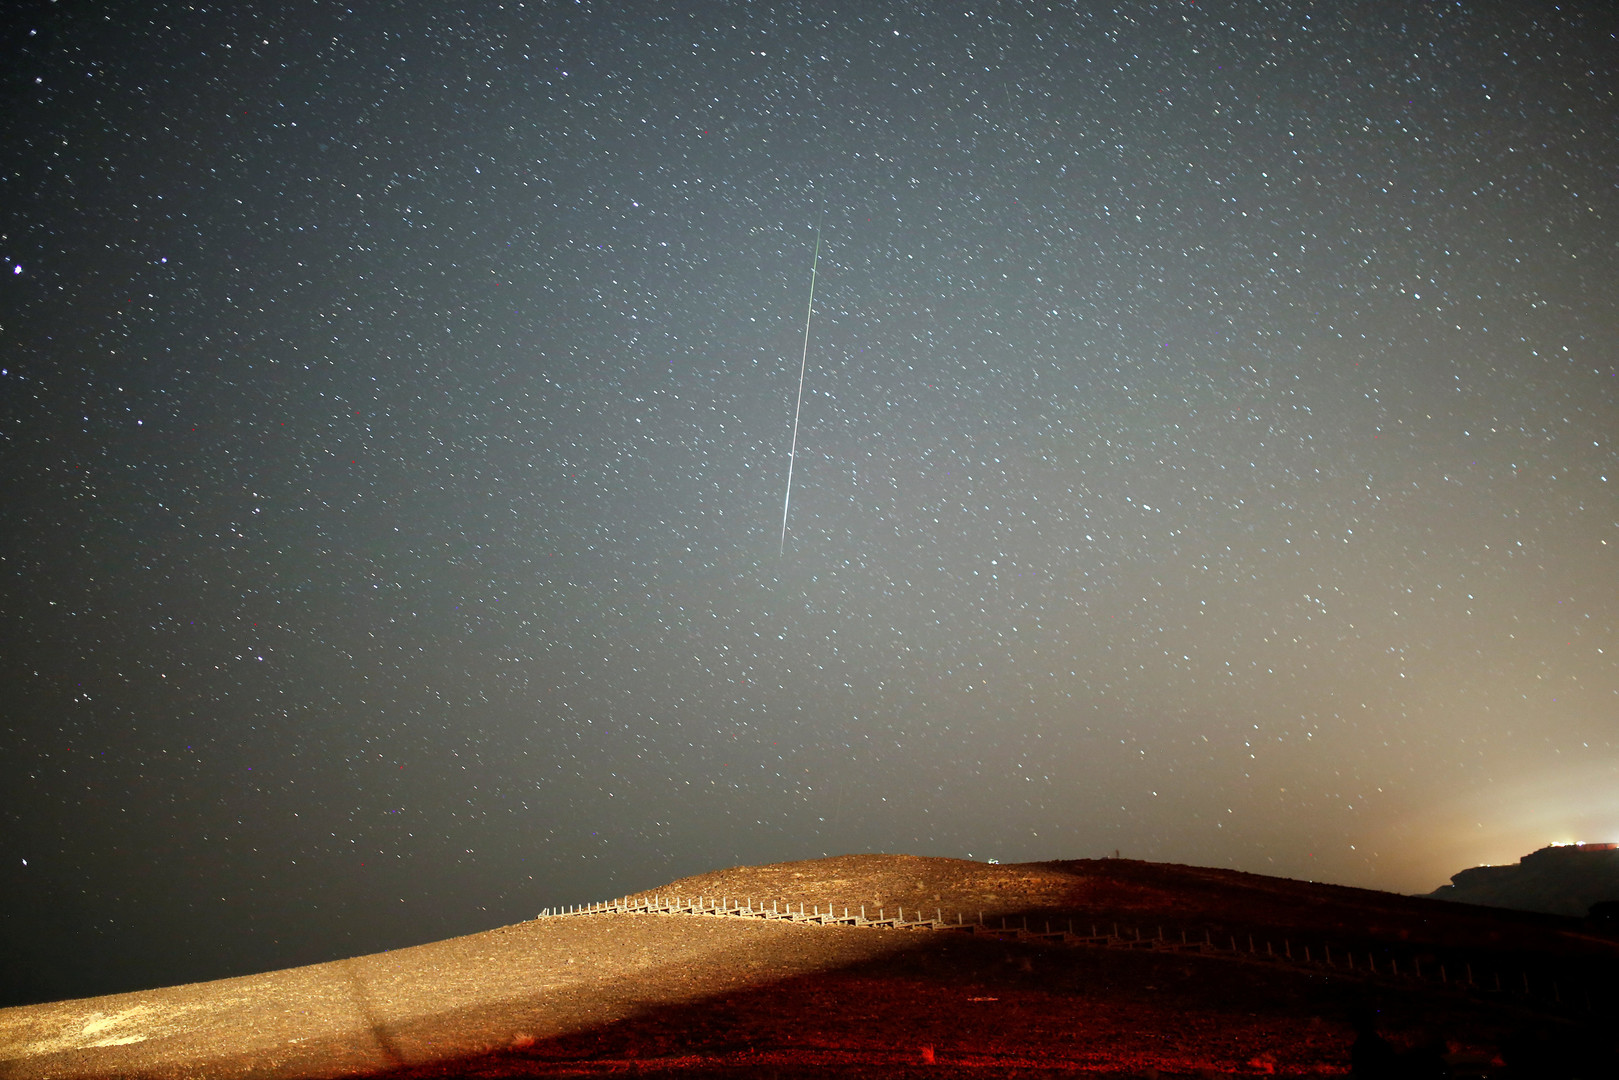 Метеорит из потока Персеиды в небе над Кратером Рамон на юге Израиля